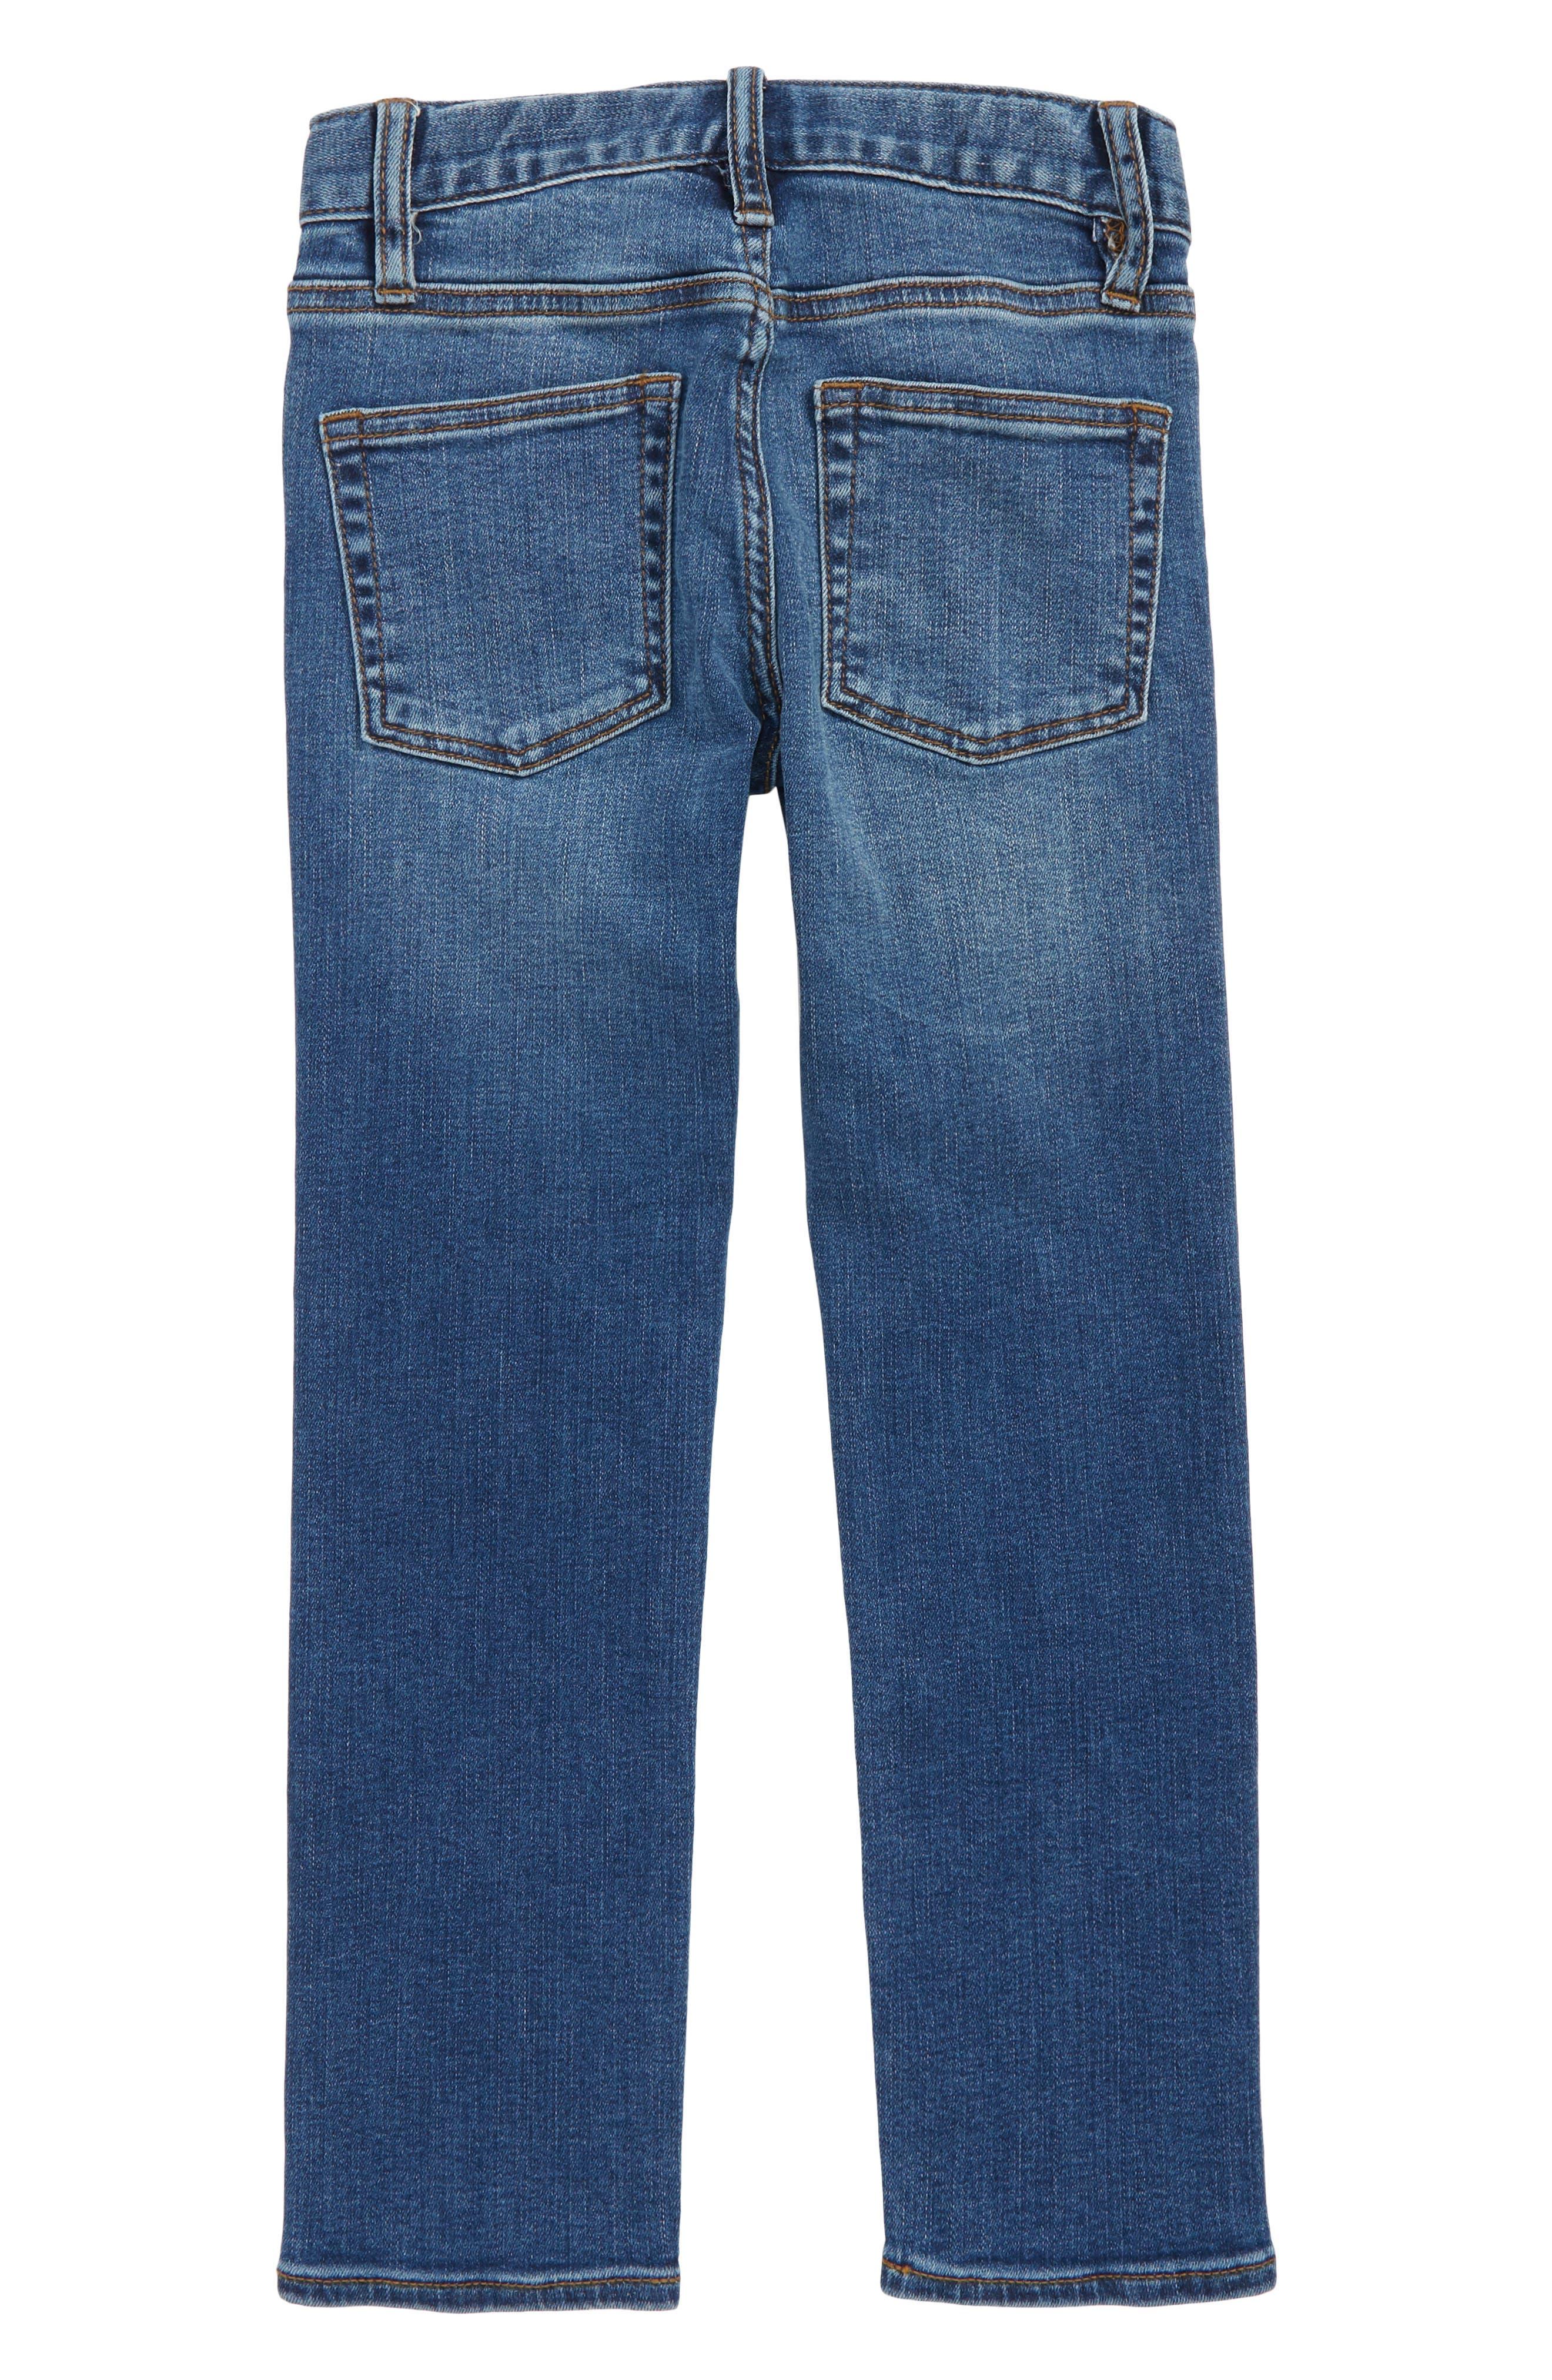 Runaround Slim Fit Jeans,                             Alternate thumbnail 2, color,                             400